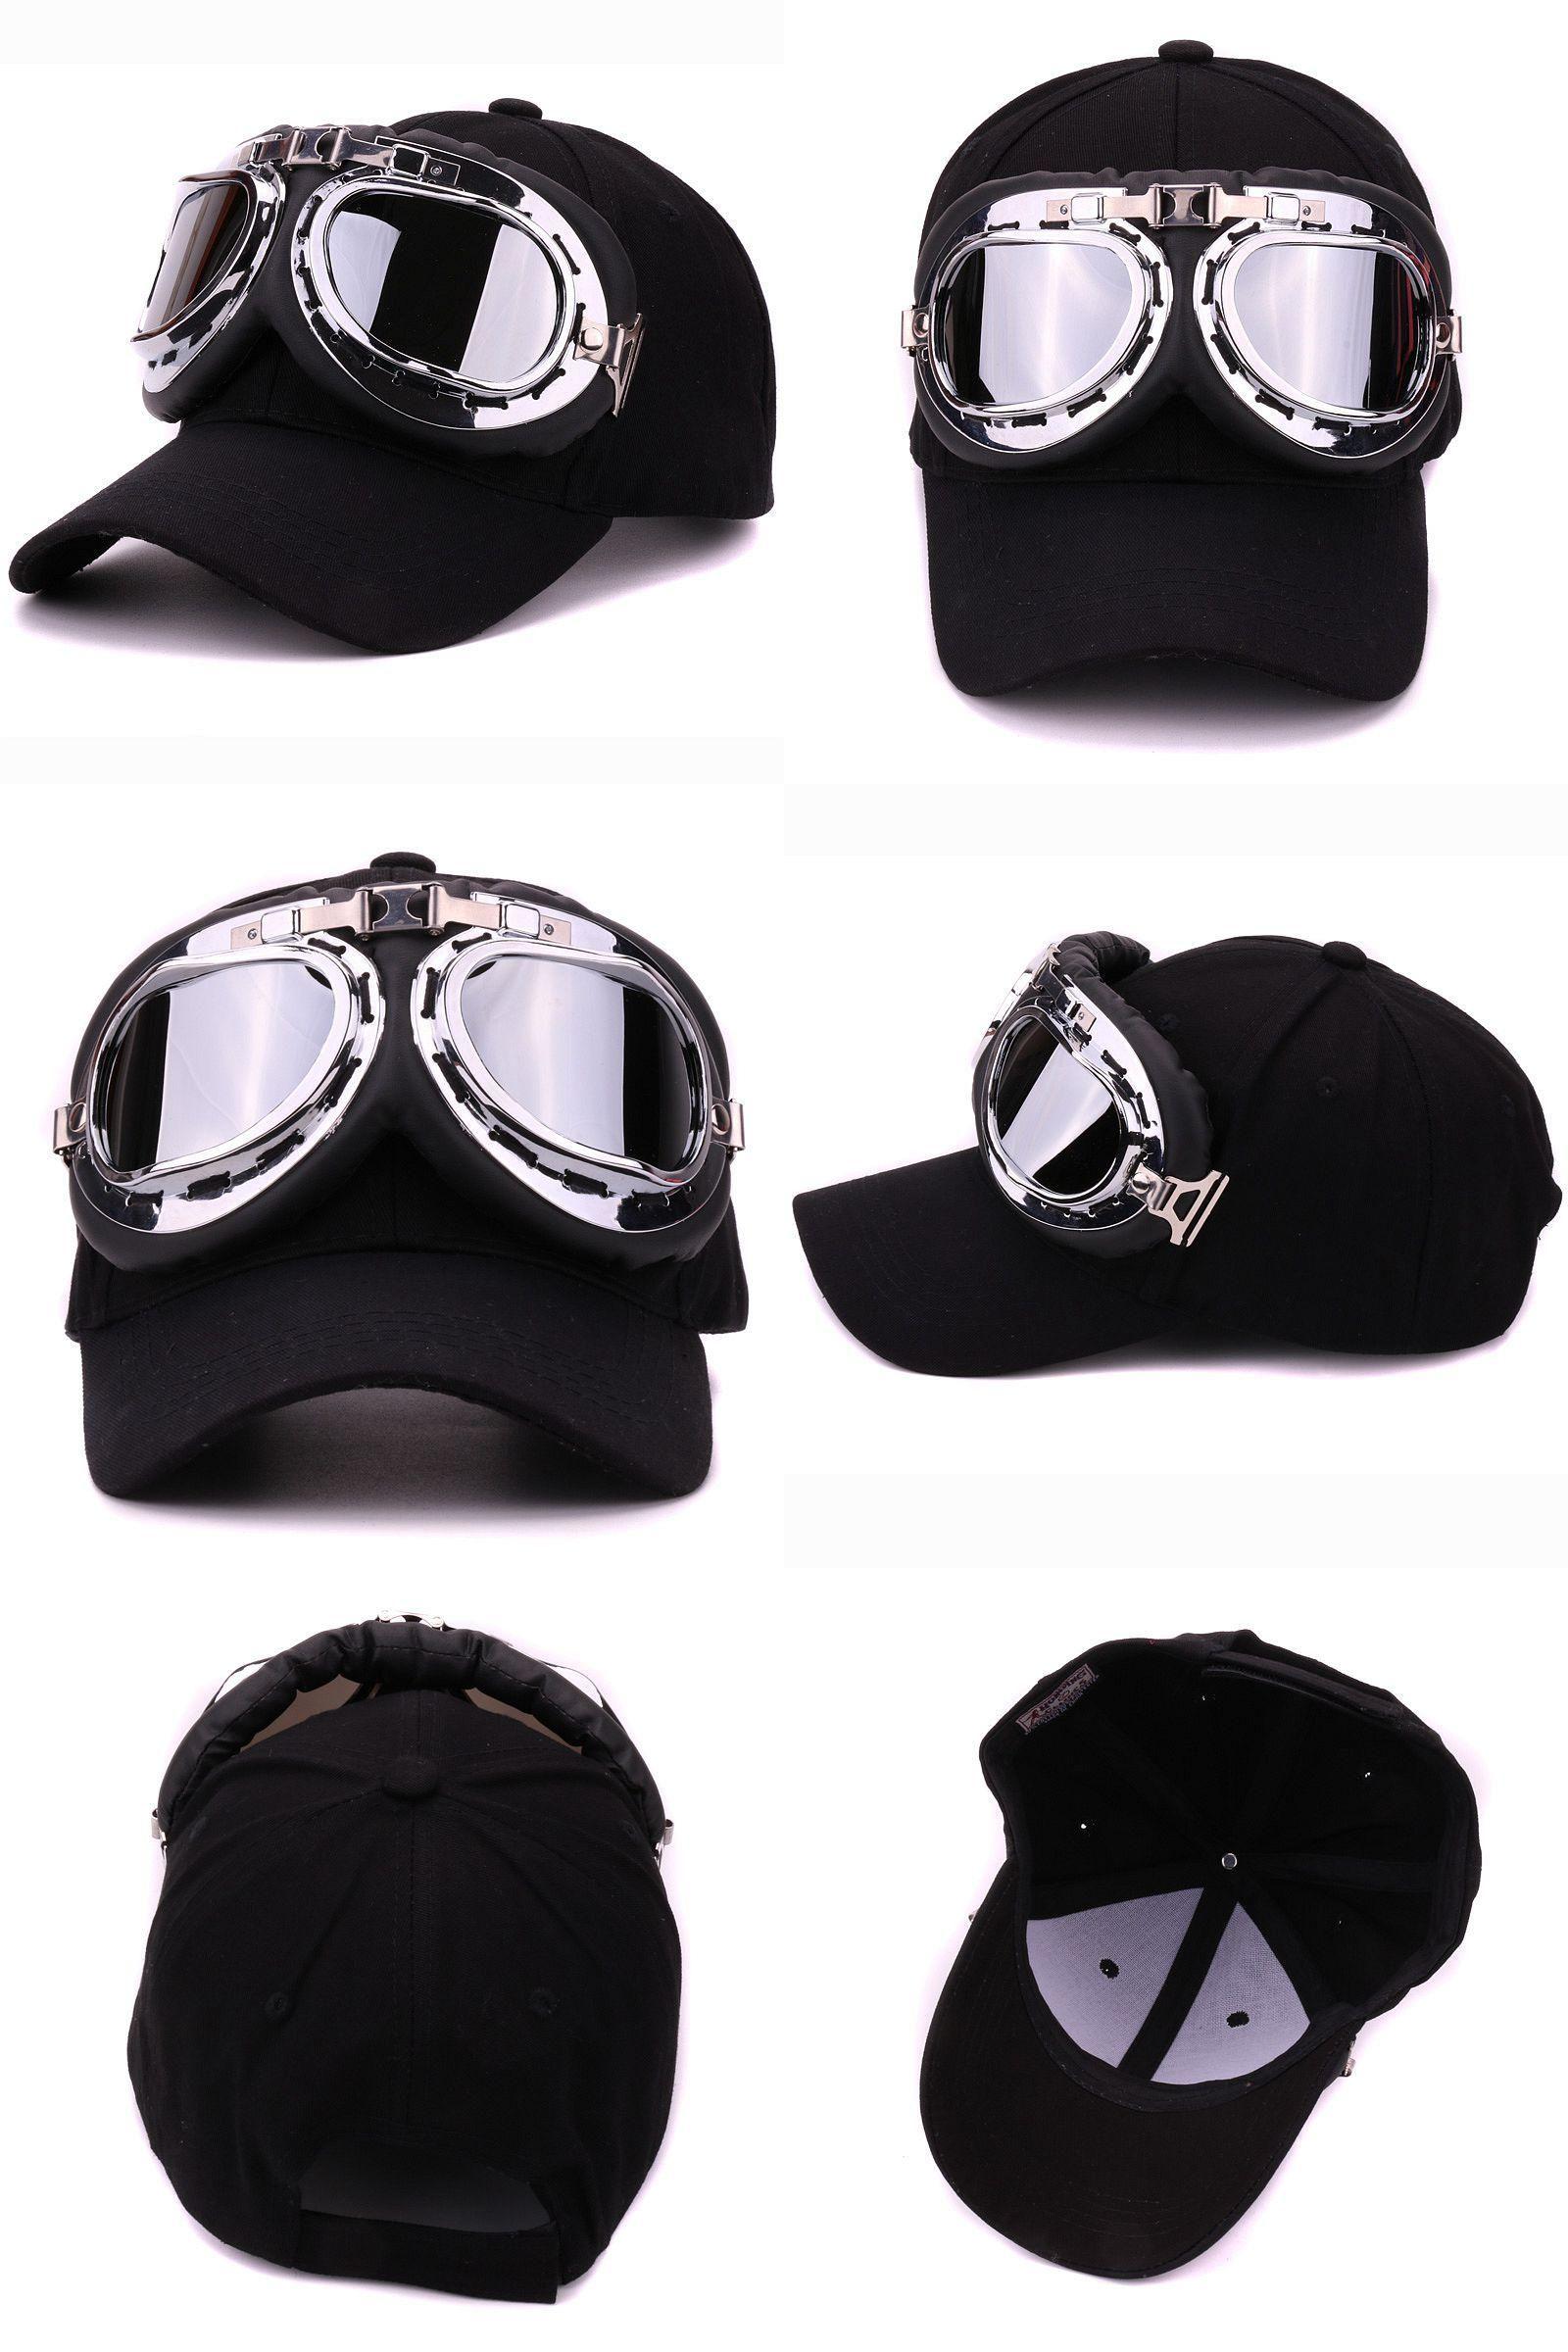 1ea724f20c8  Visit to Buy  Fancy cotton 6 panels ski goggles baseball cap with polite  glasses